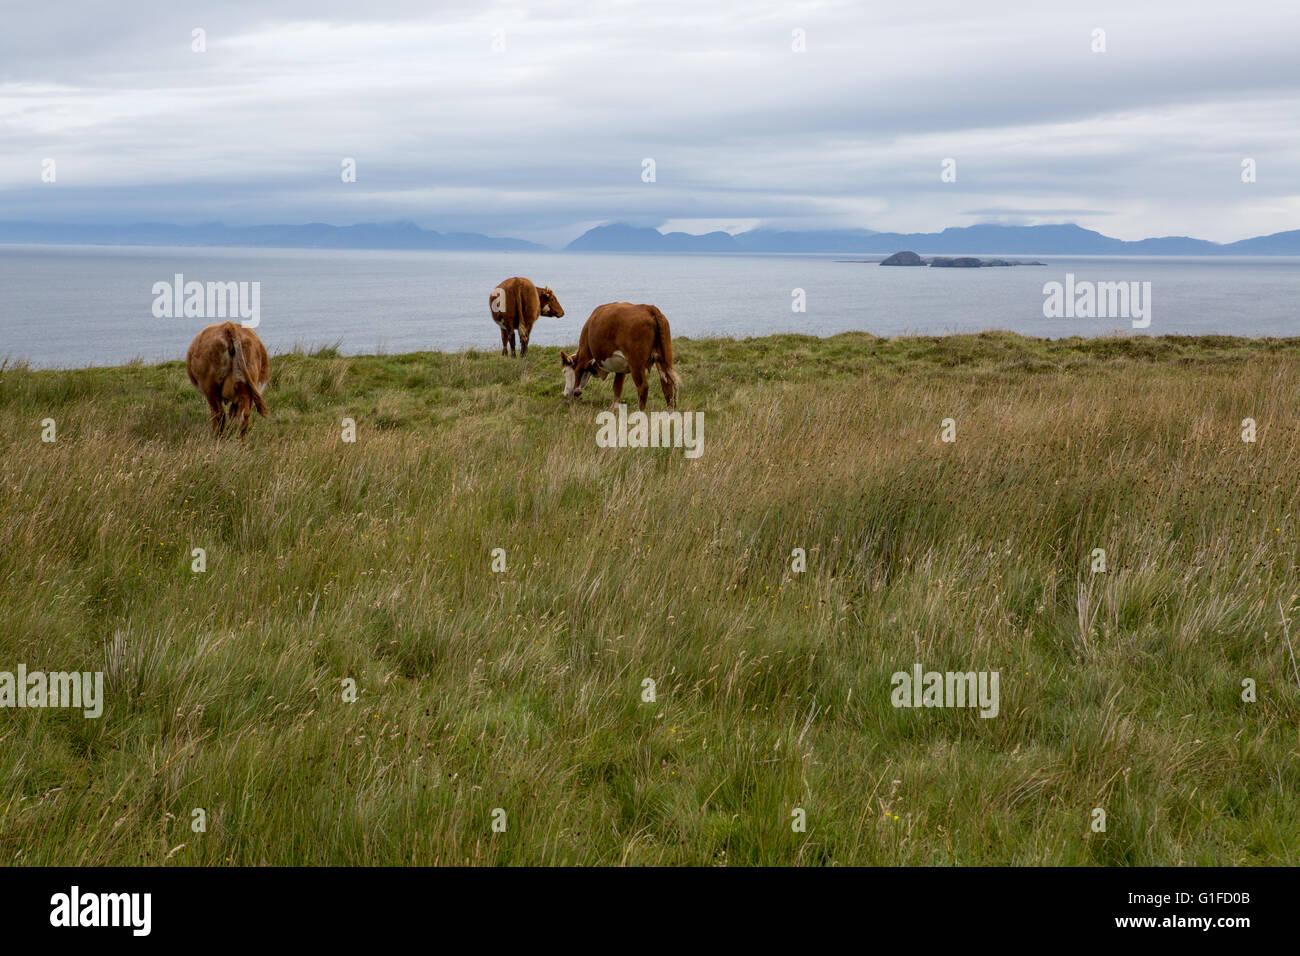 Cows in field, Northern Coast of Isle of Skye, Inner Hebrides, Scotland, UK - Stock Image